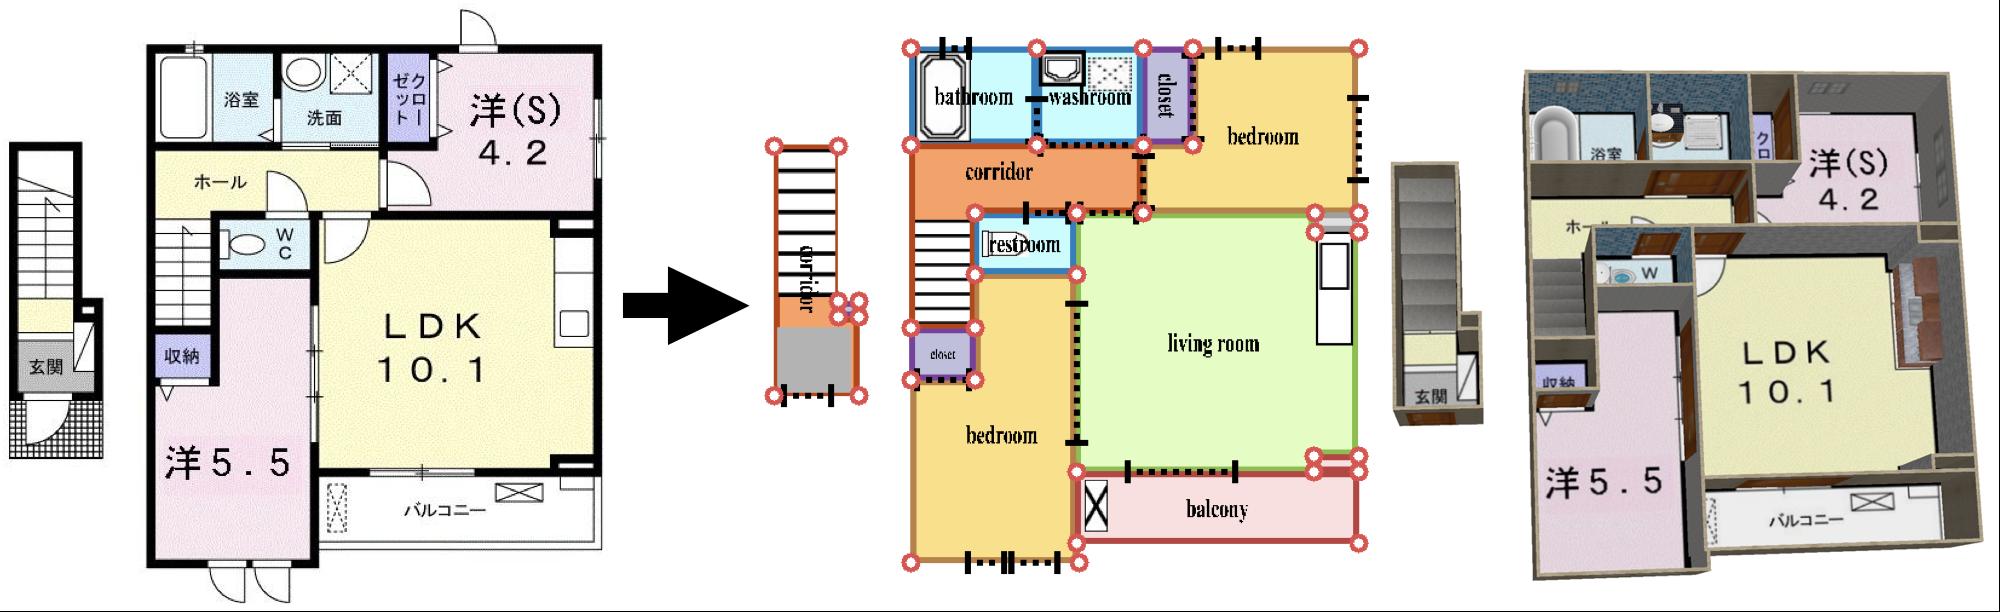 2000x612 Raster To Vector Revisiting Floorplan Transformation